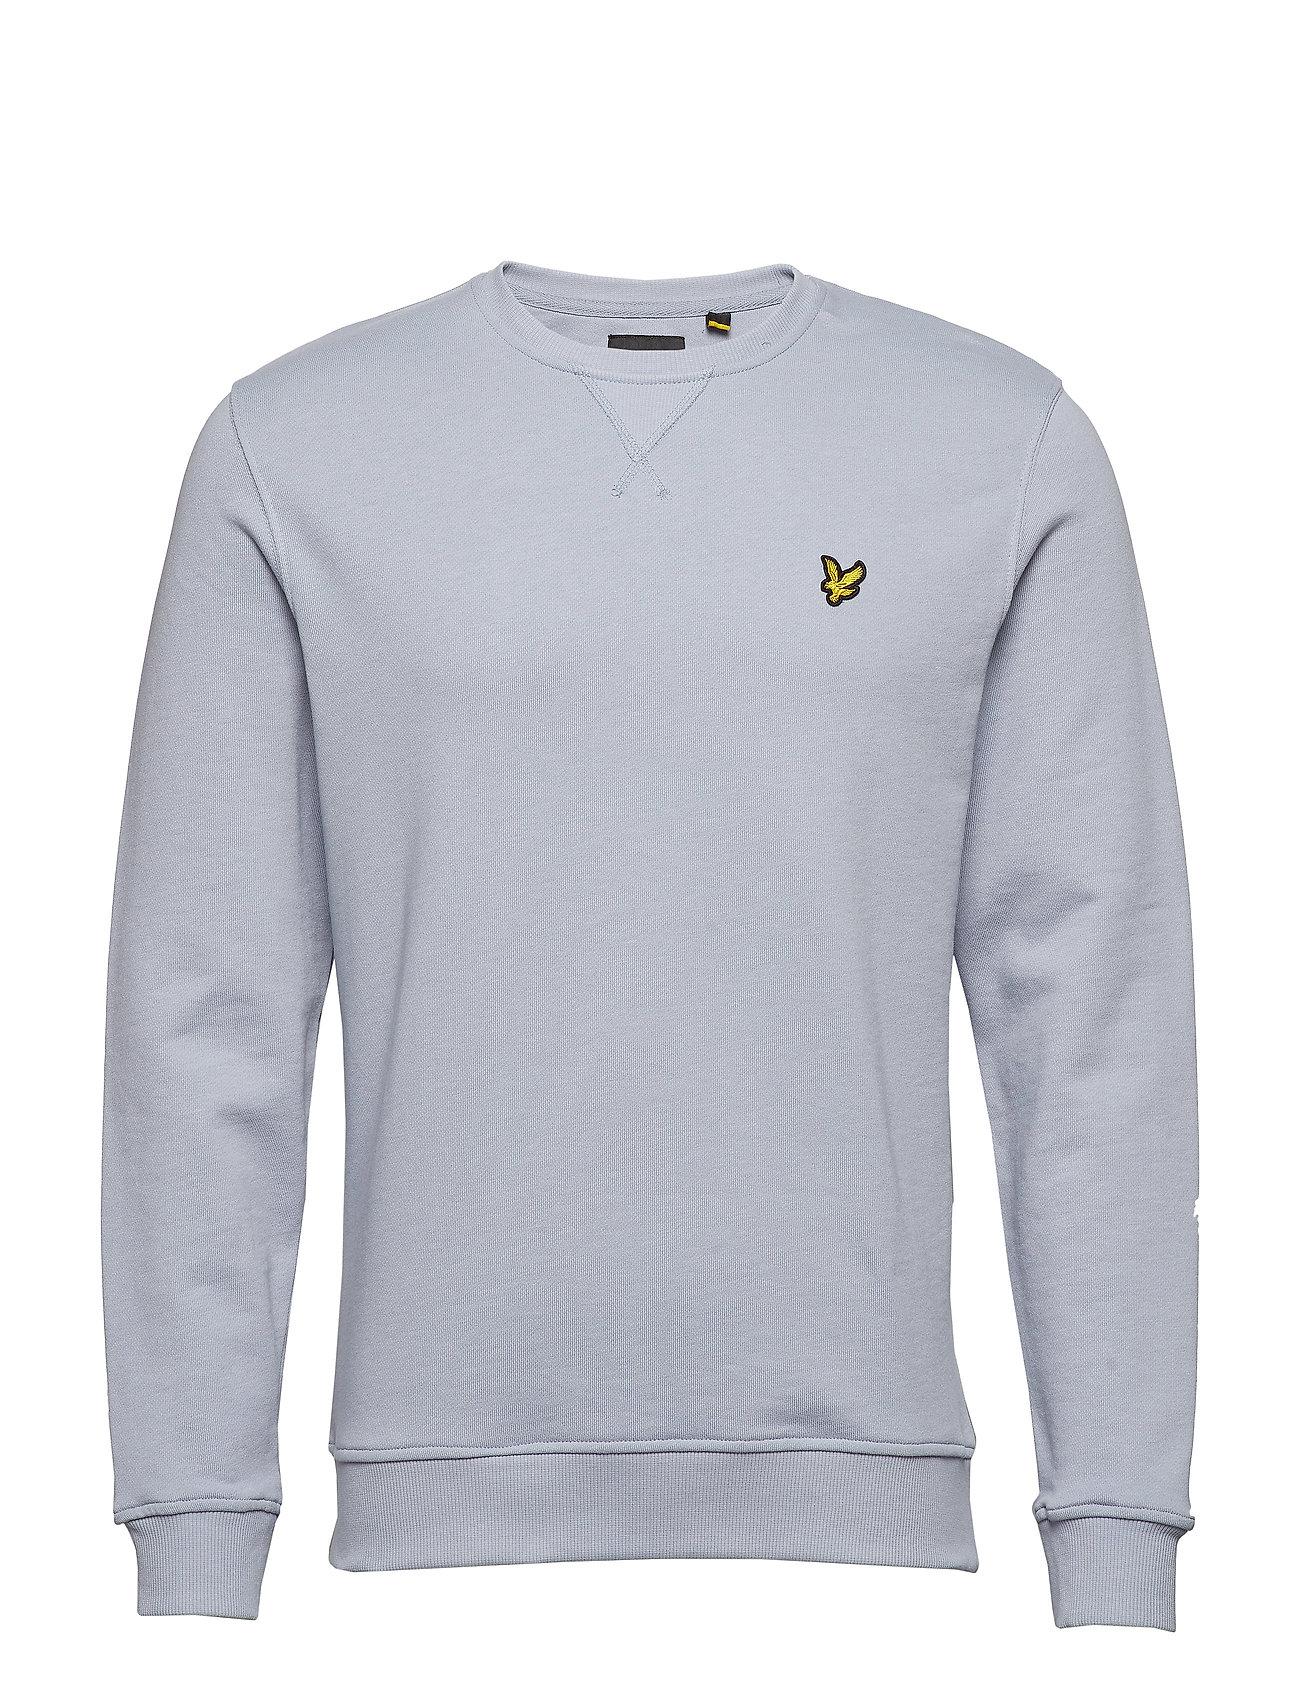 Lyle & Scott Crew Neck Sweatshirt - CLOUD BLUE